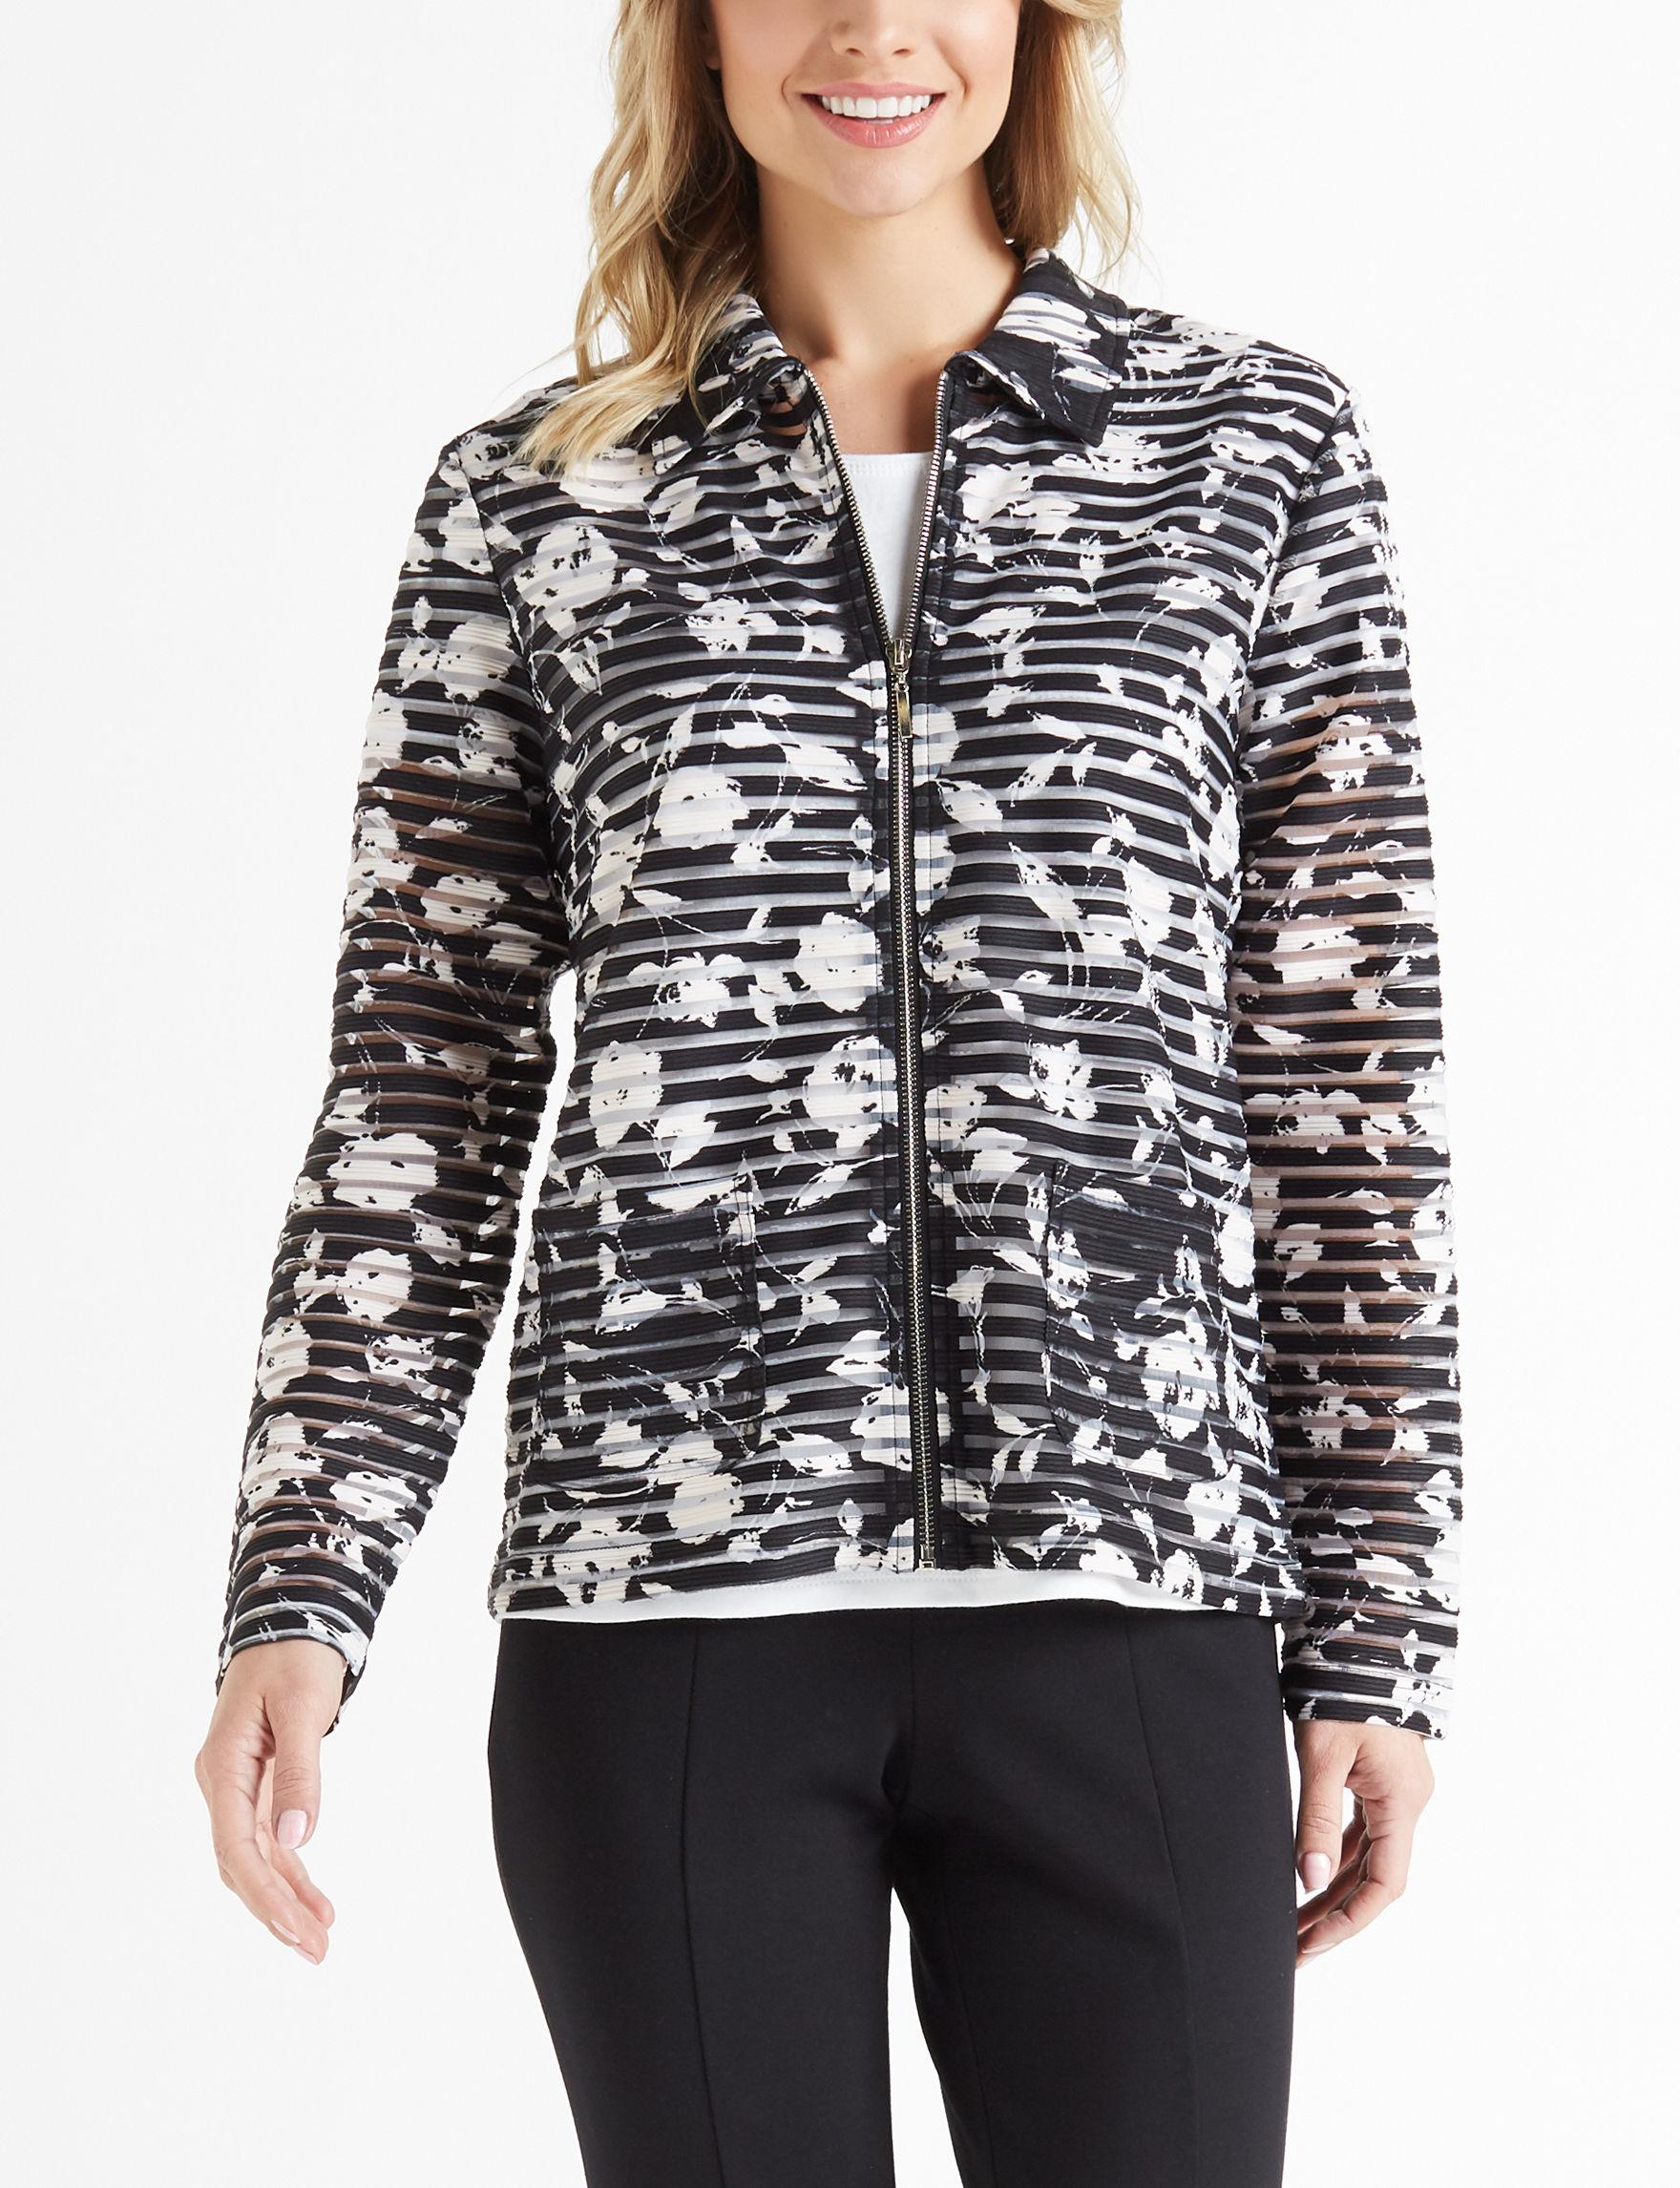 Cathy Daniels Black Lightweight Jackets & Blazers